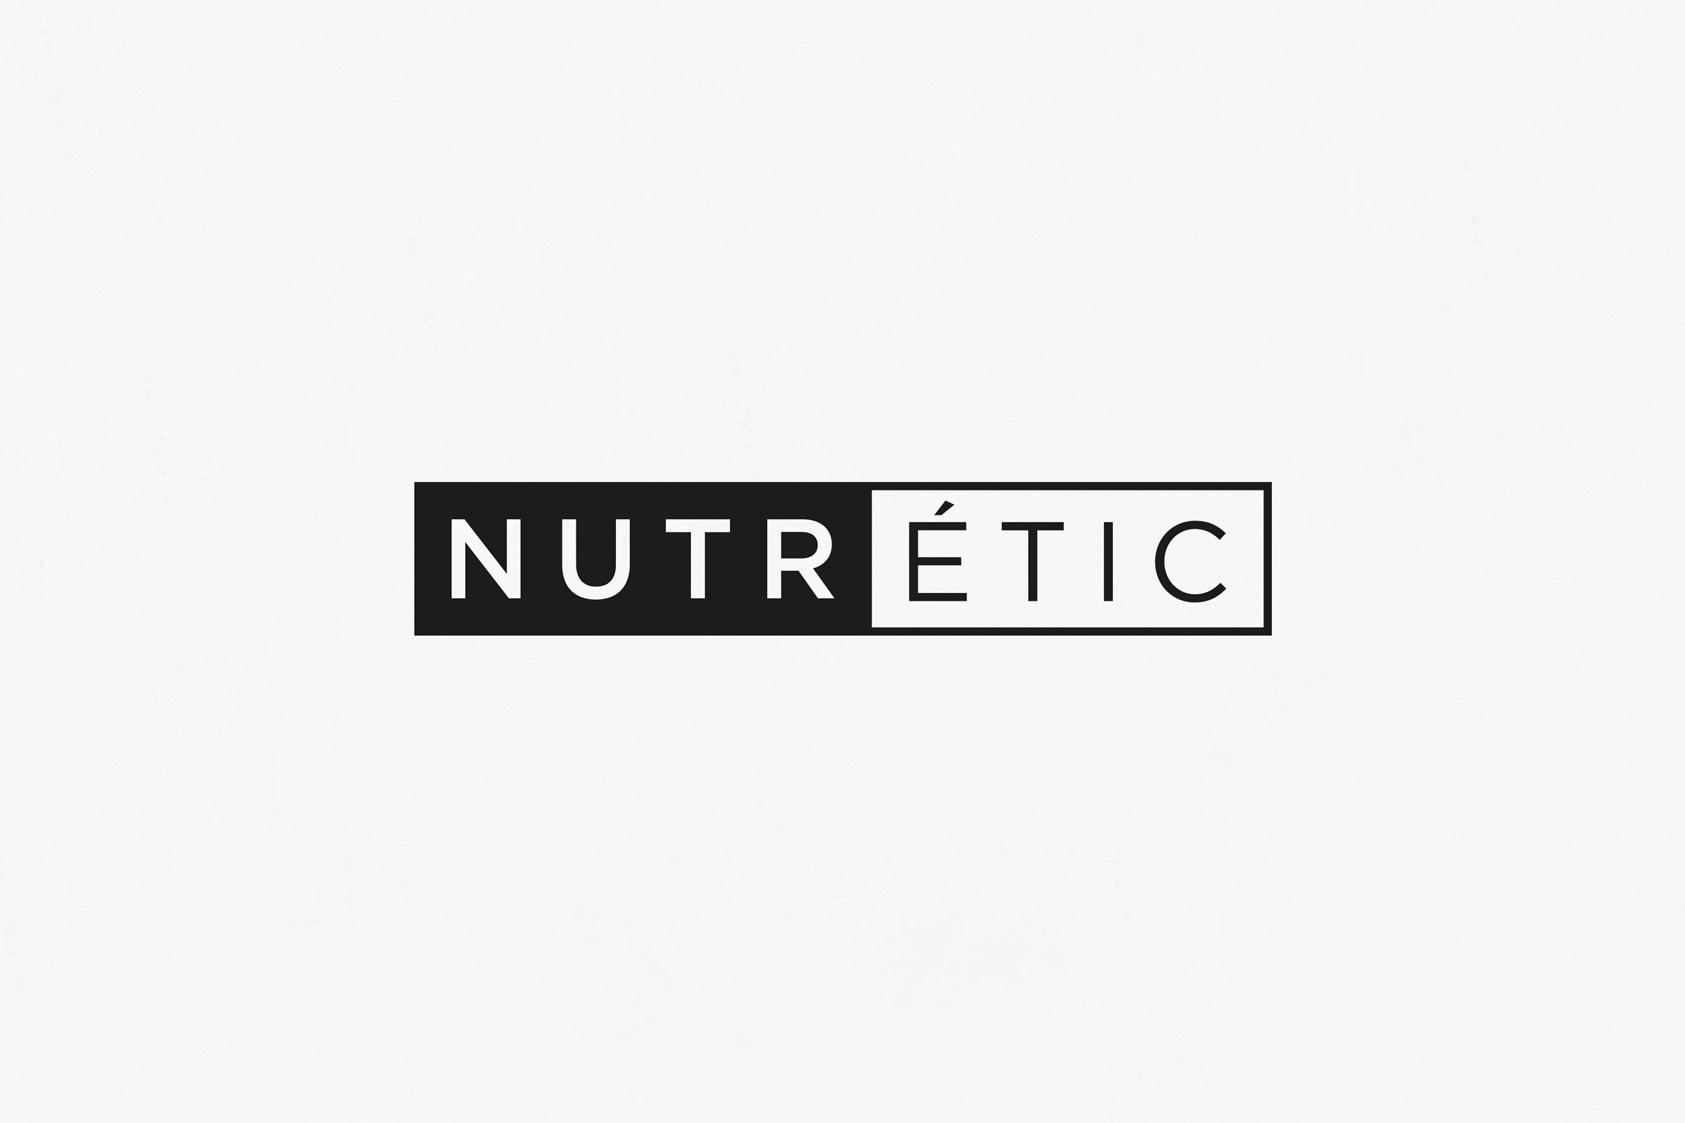 NUTRÉTIC